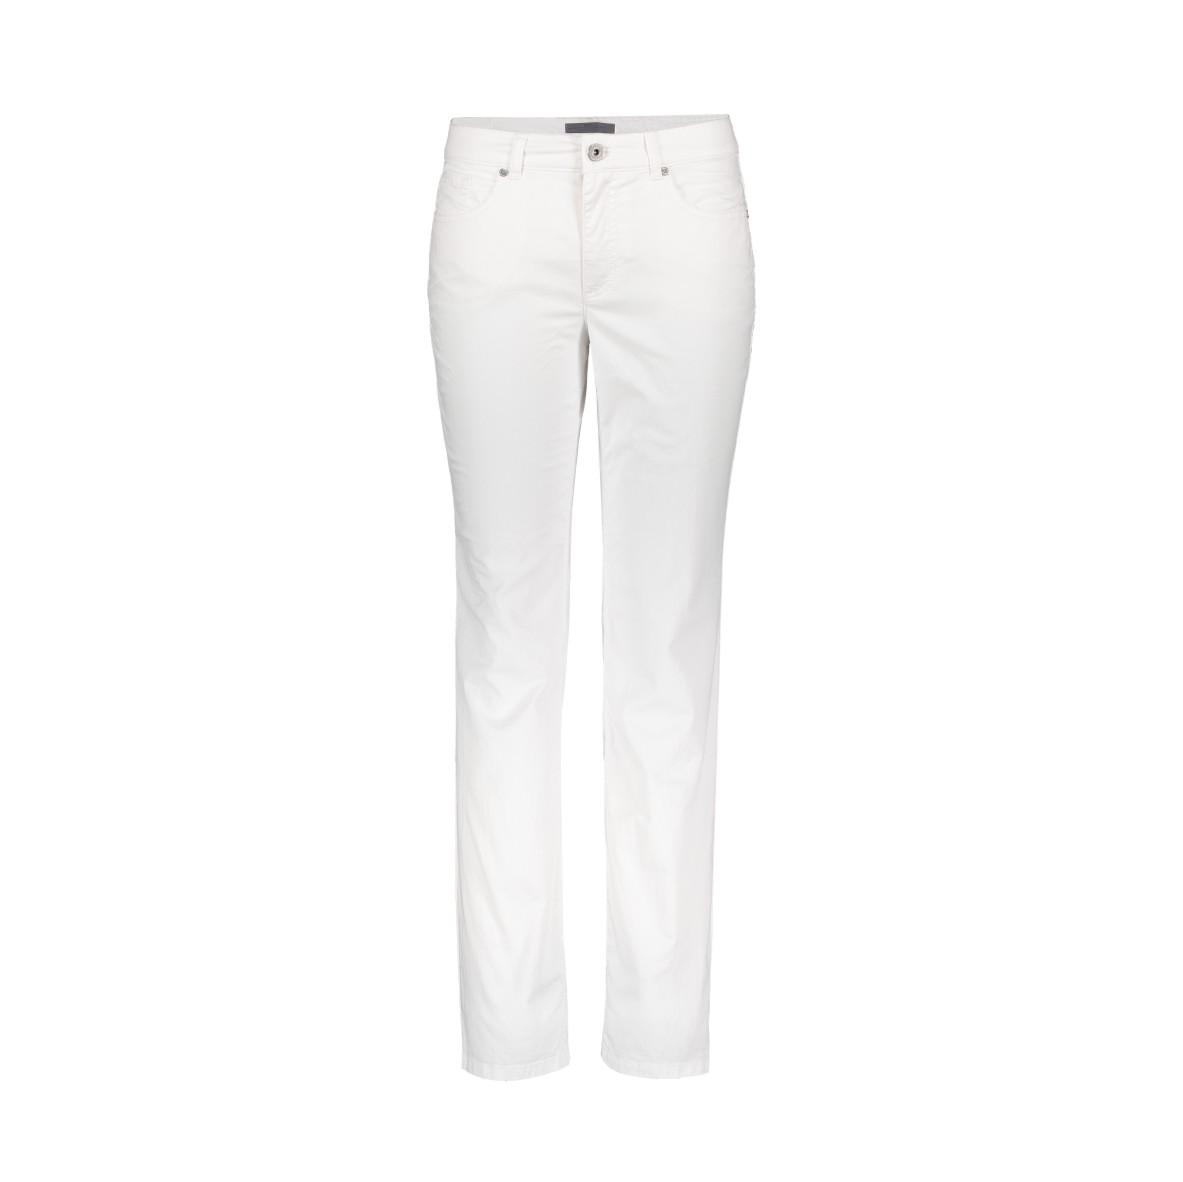 mac melanie damen jeans wei siemers online shop. Black Bedroom Furniture Sets. Home Design Ideas